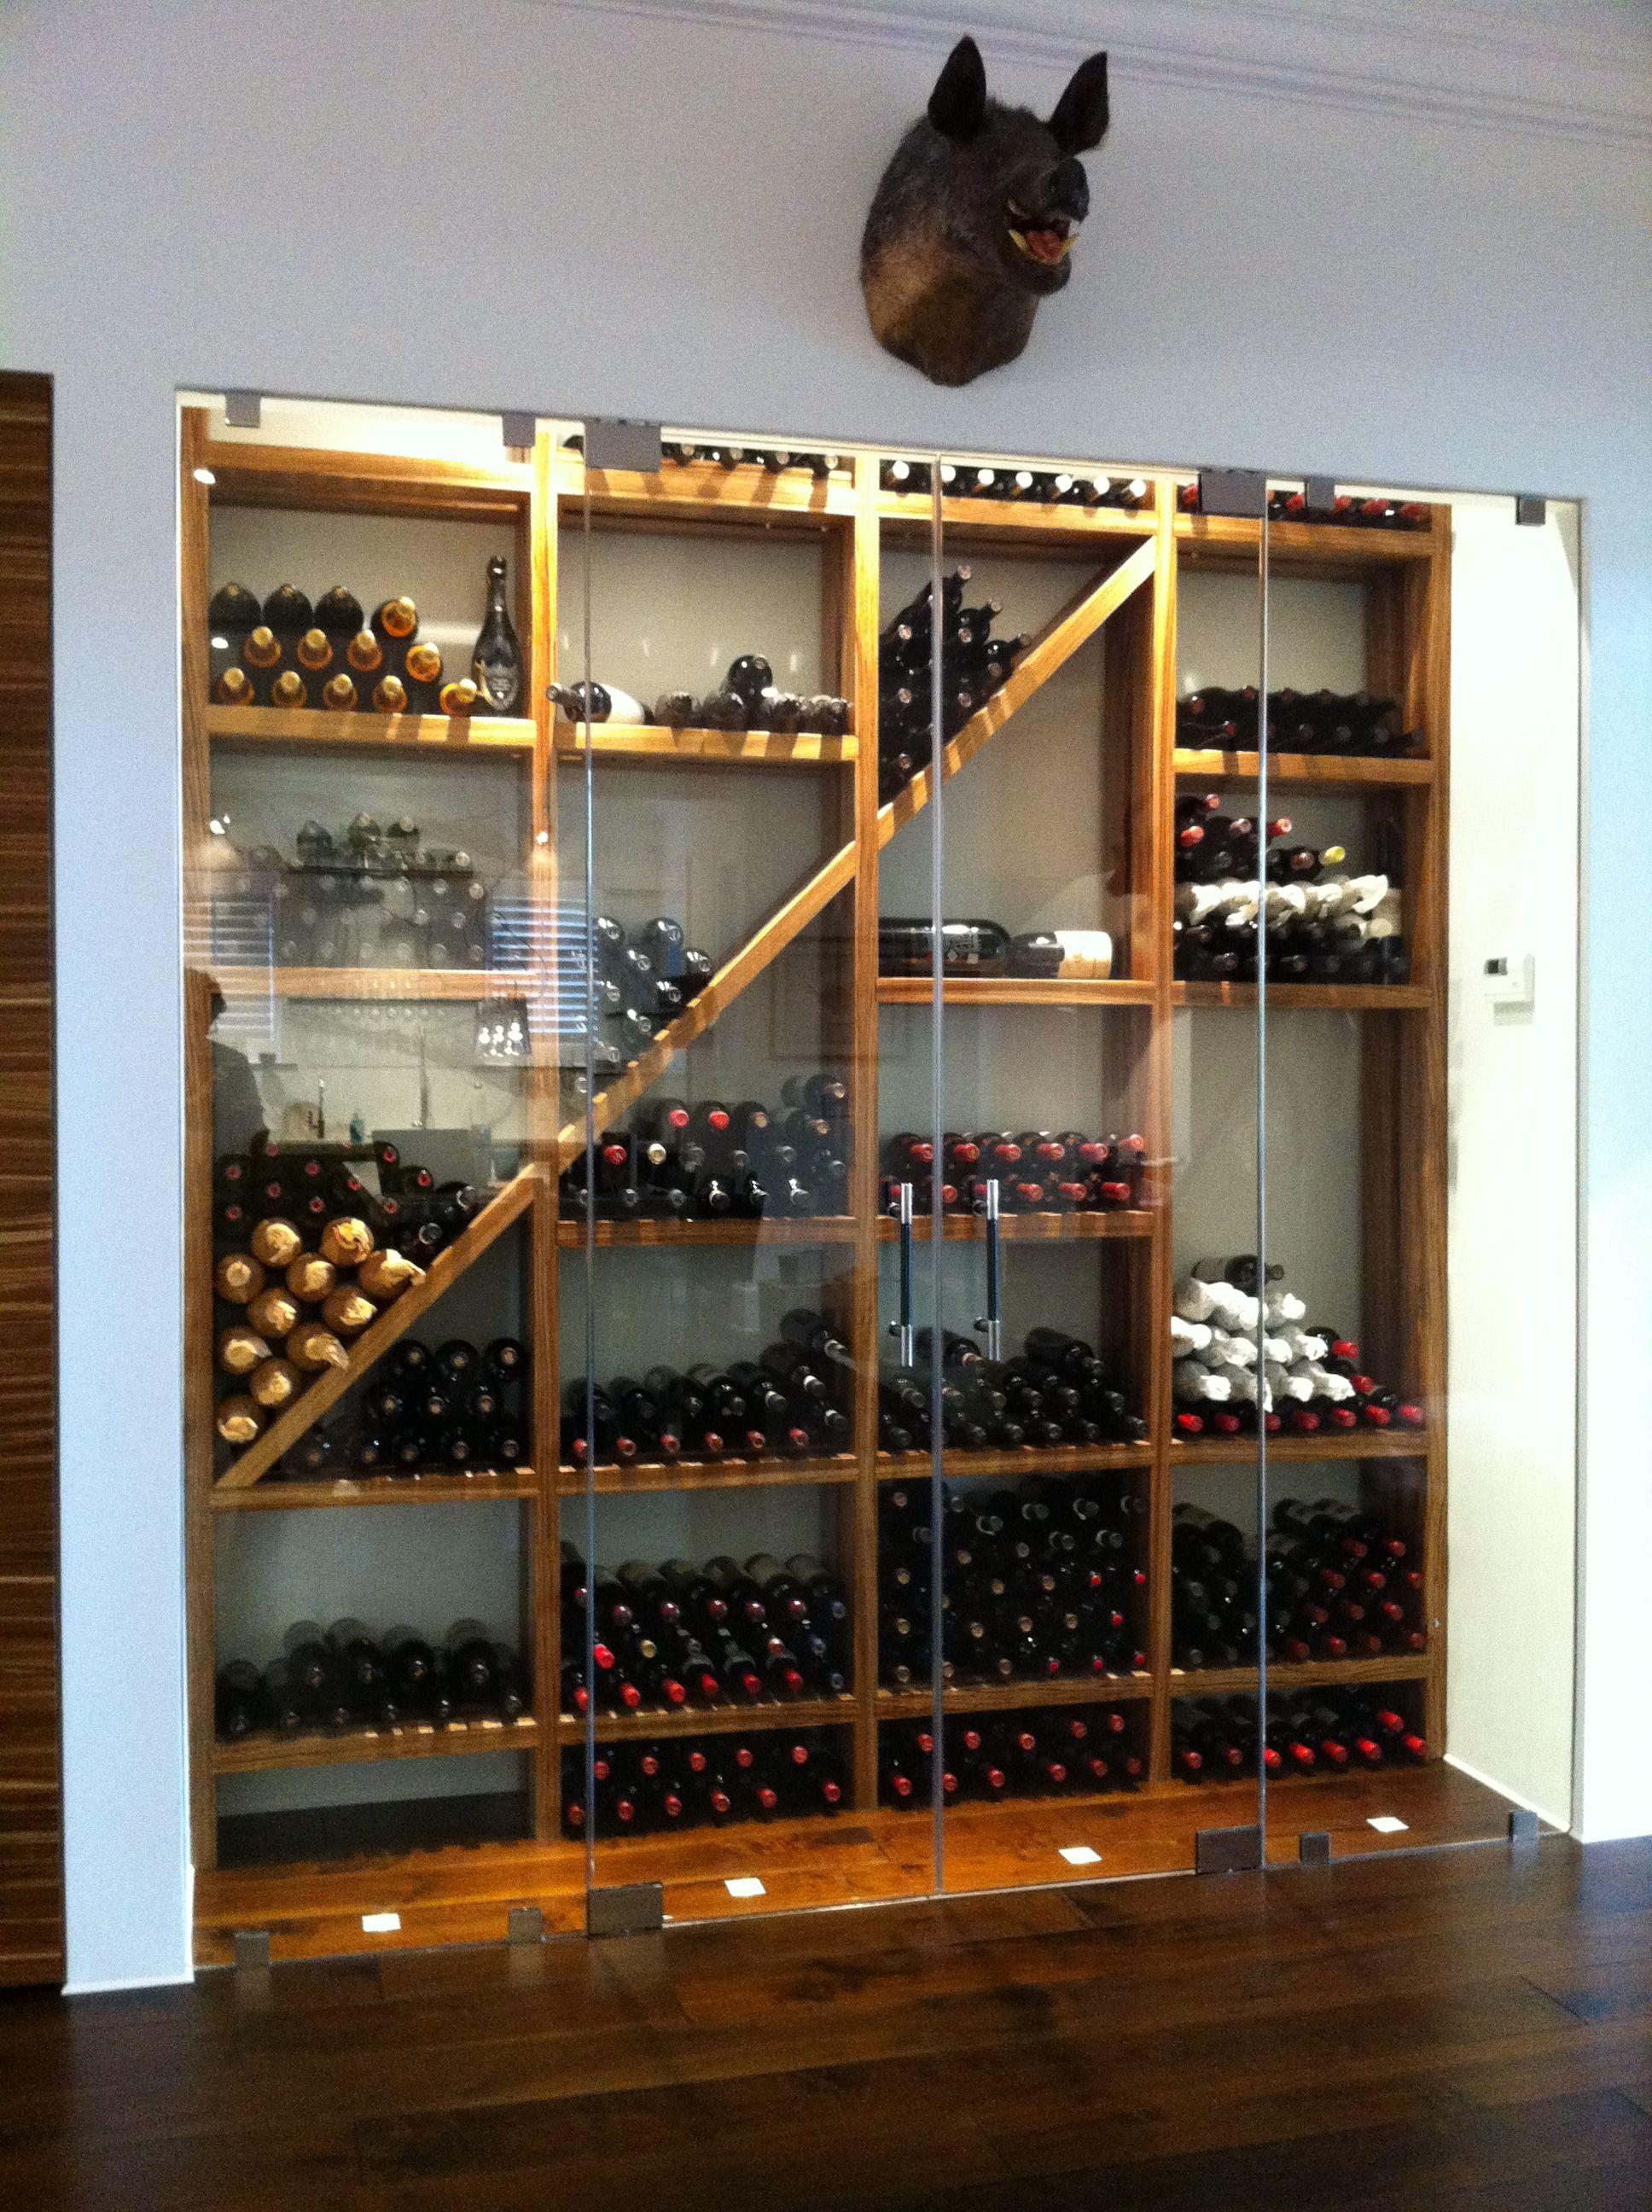 garage cellar building conversion cellars racks storage img to joseph rack wine blogs with